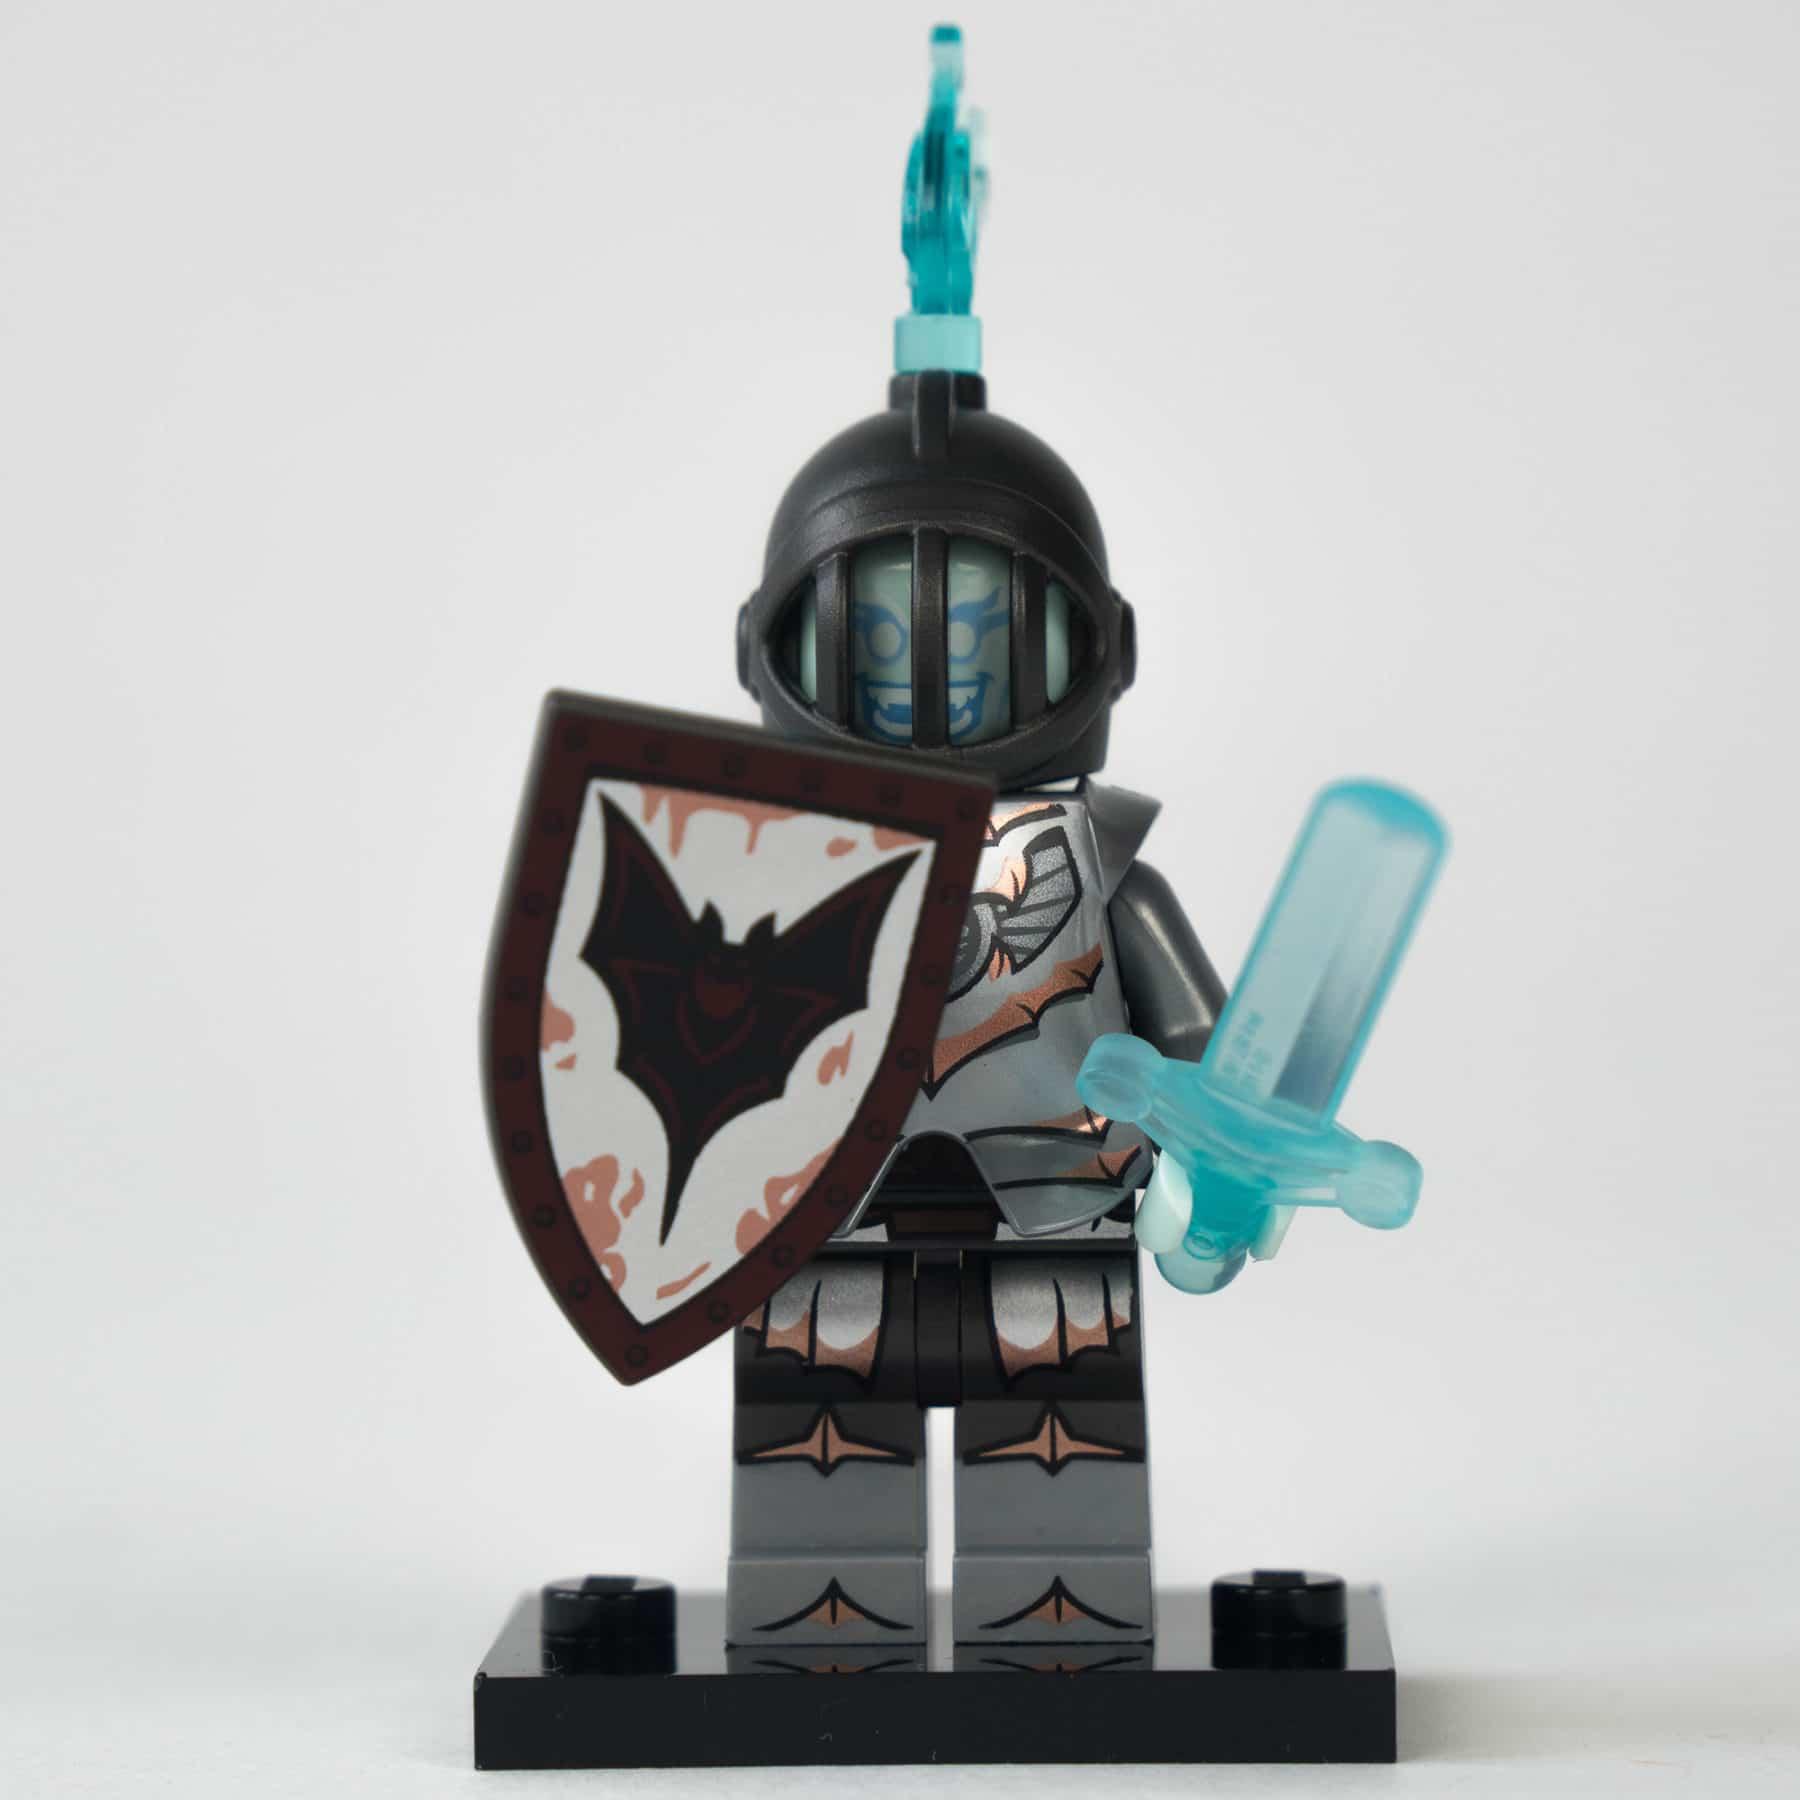 LEGO 71025 Minifigur: Ritter